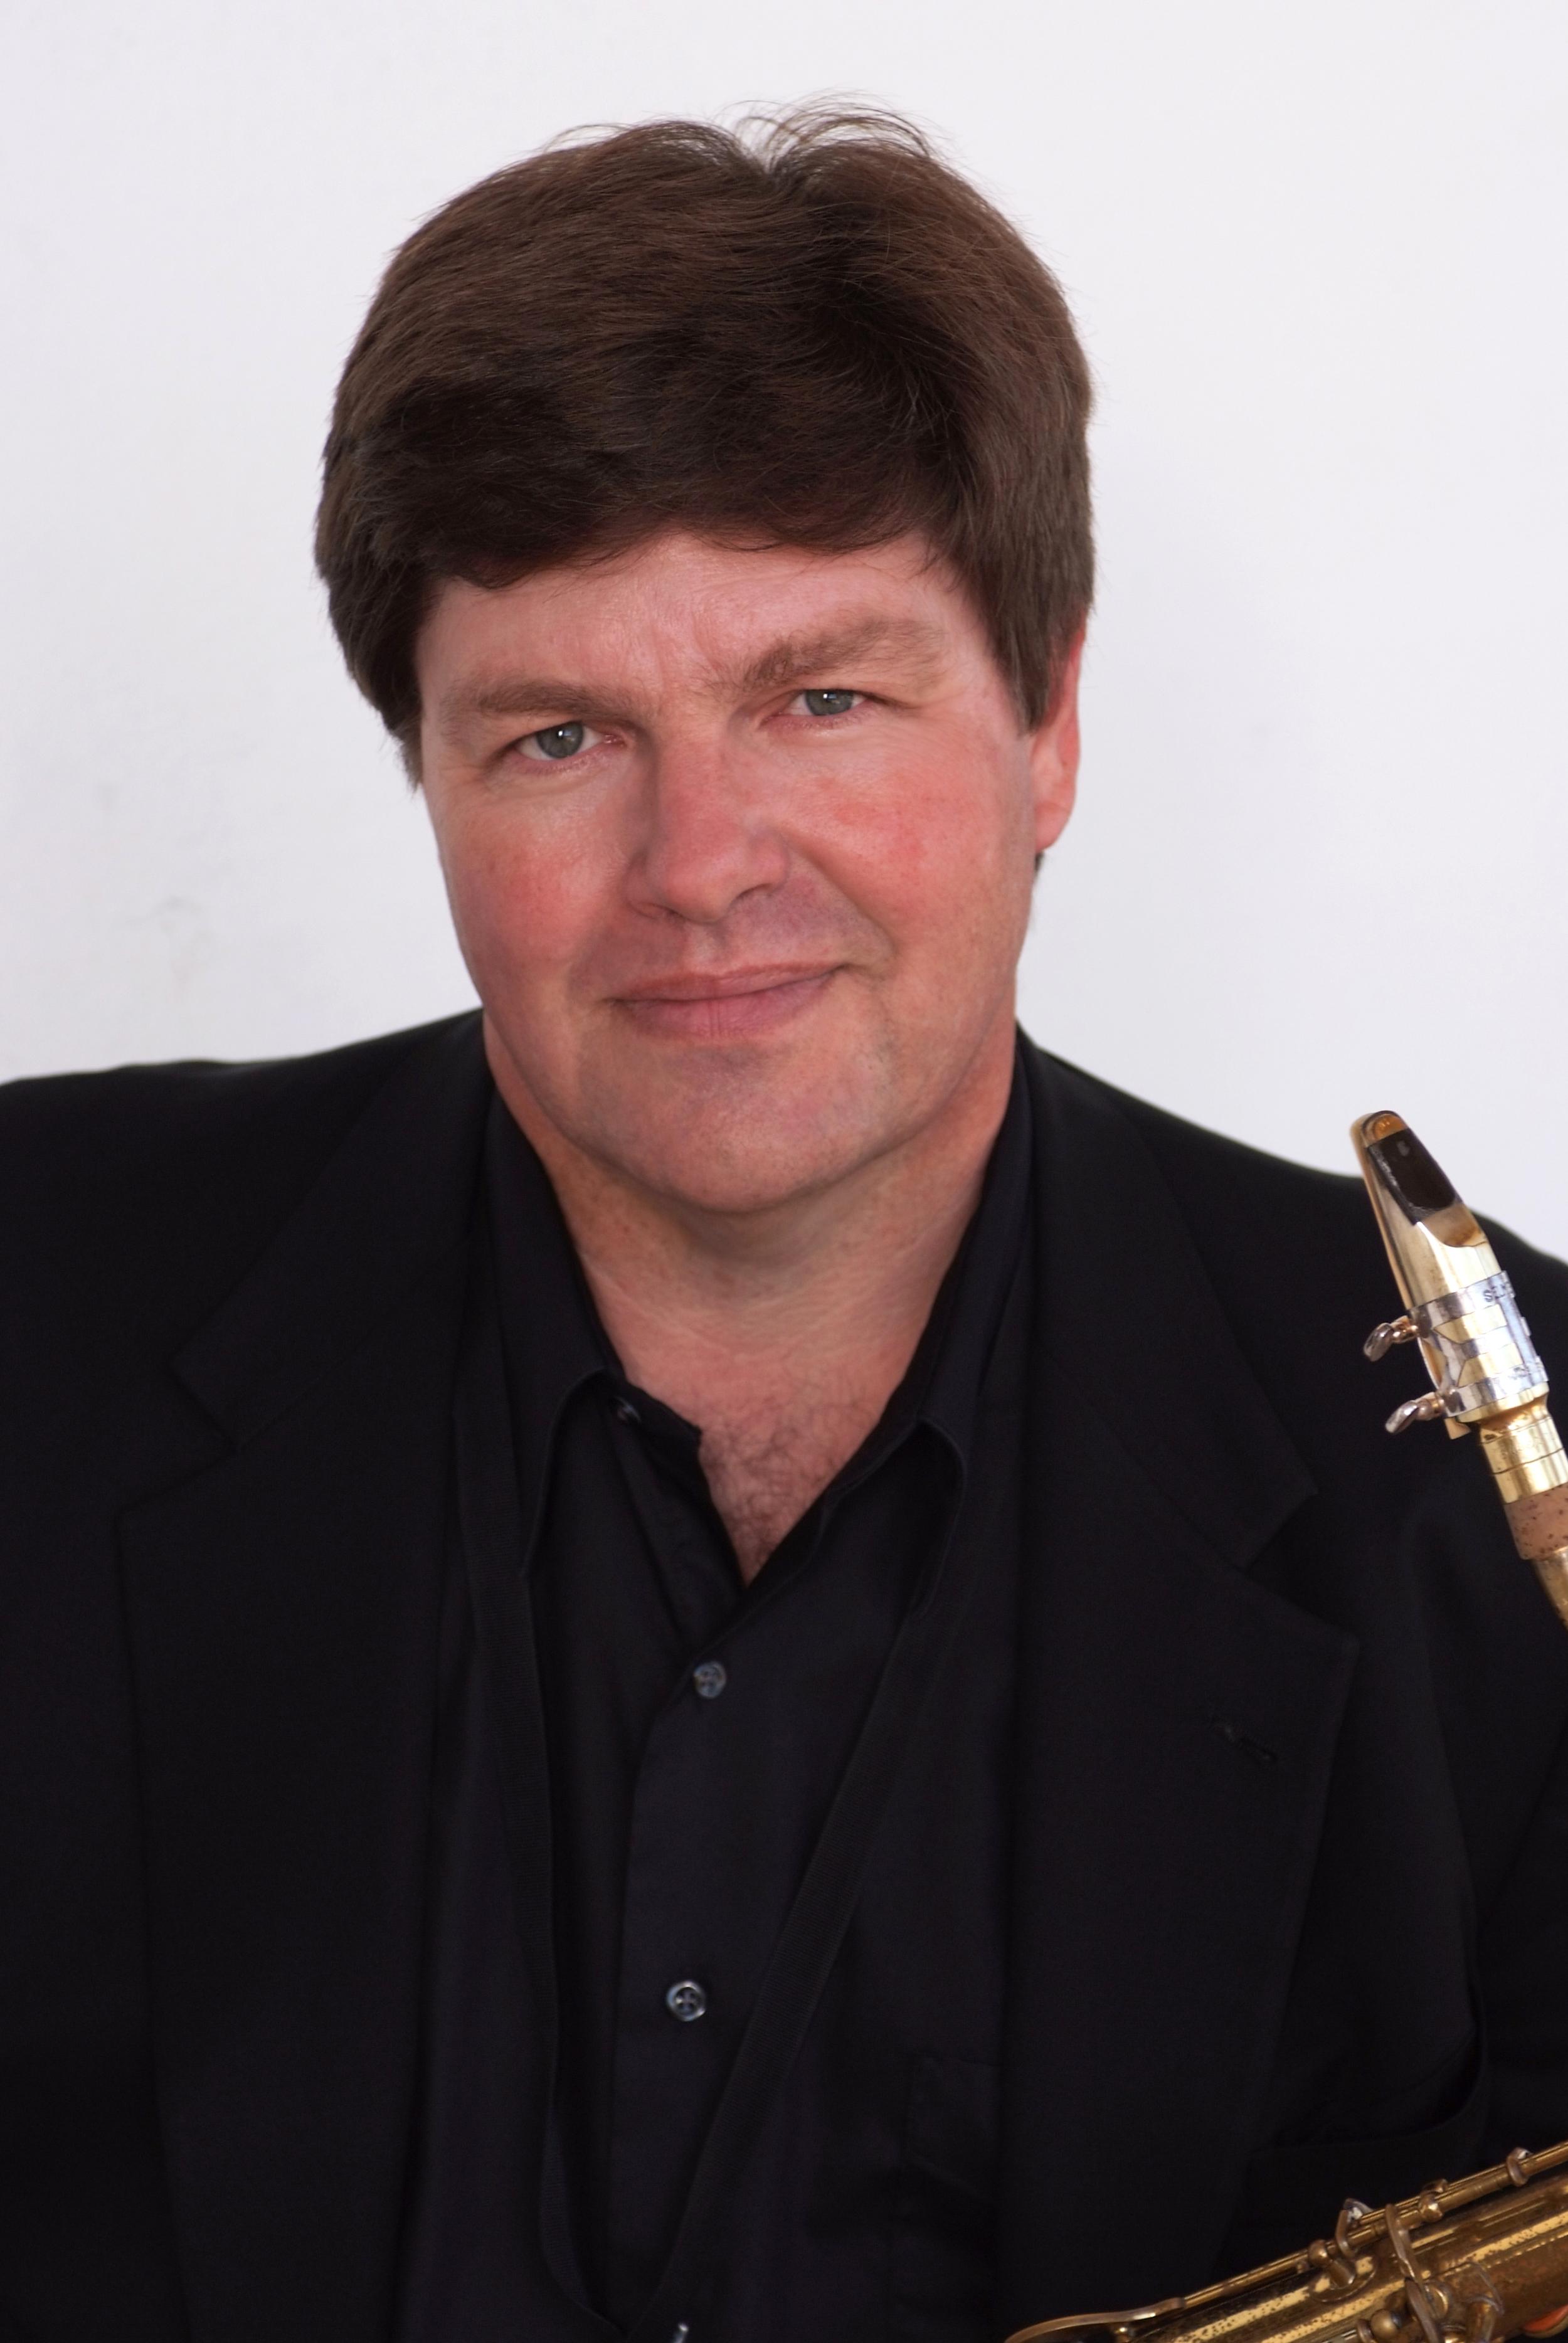 Jay Mason, saxophone